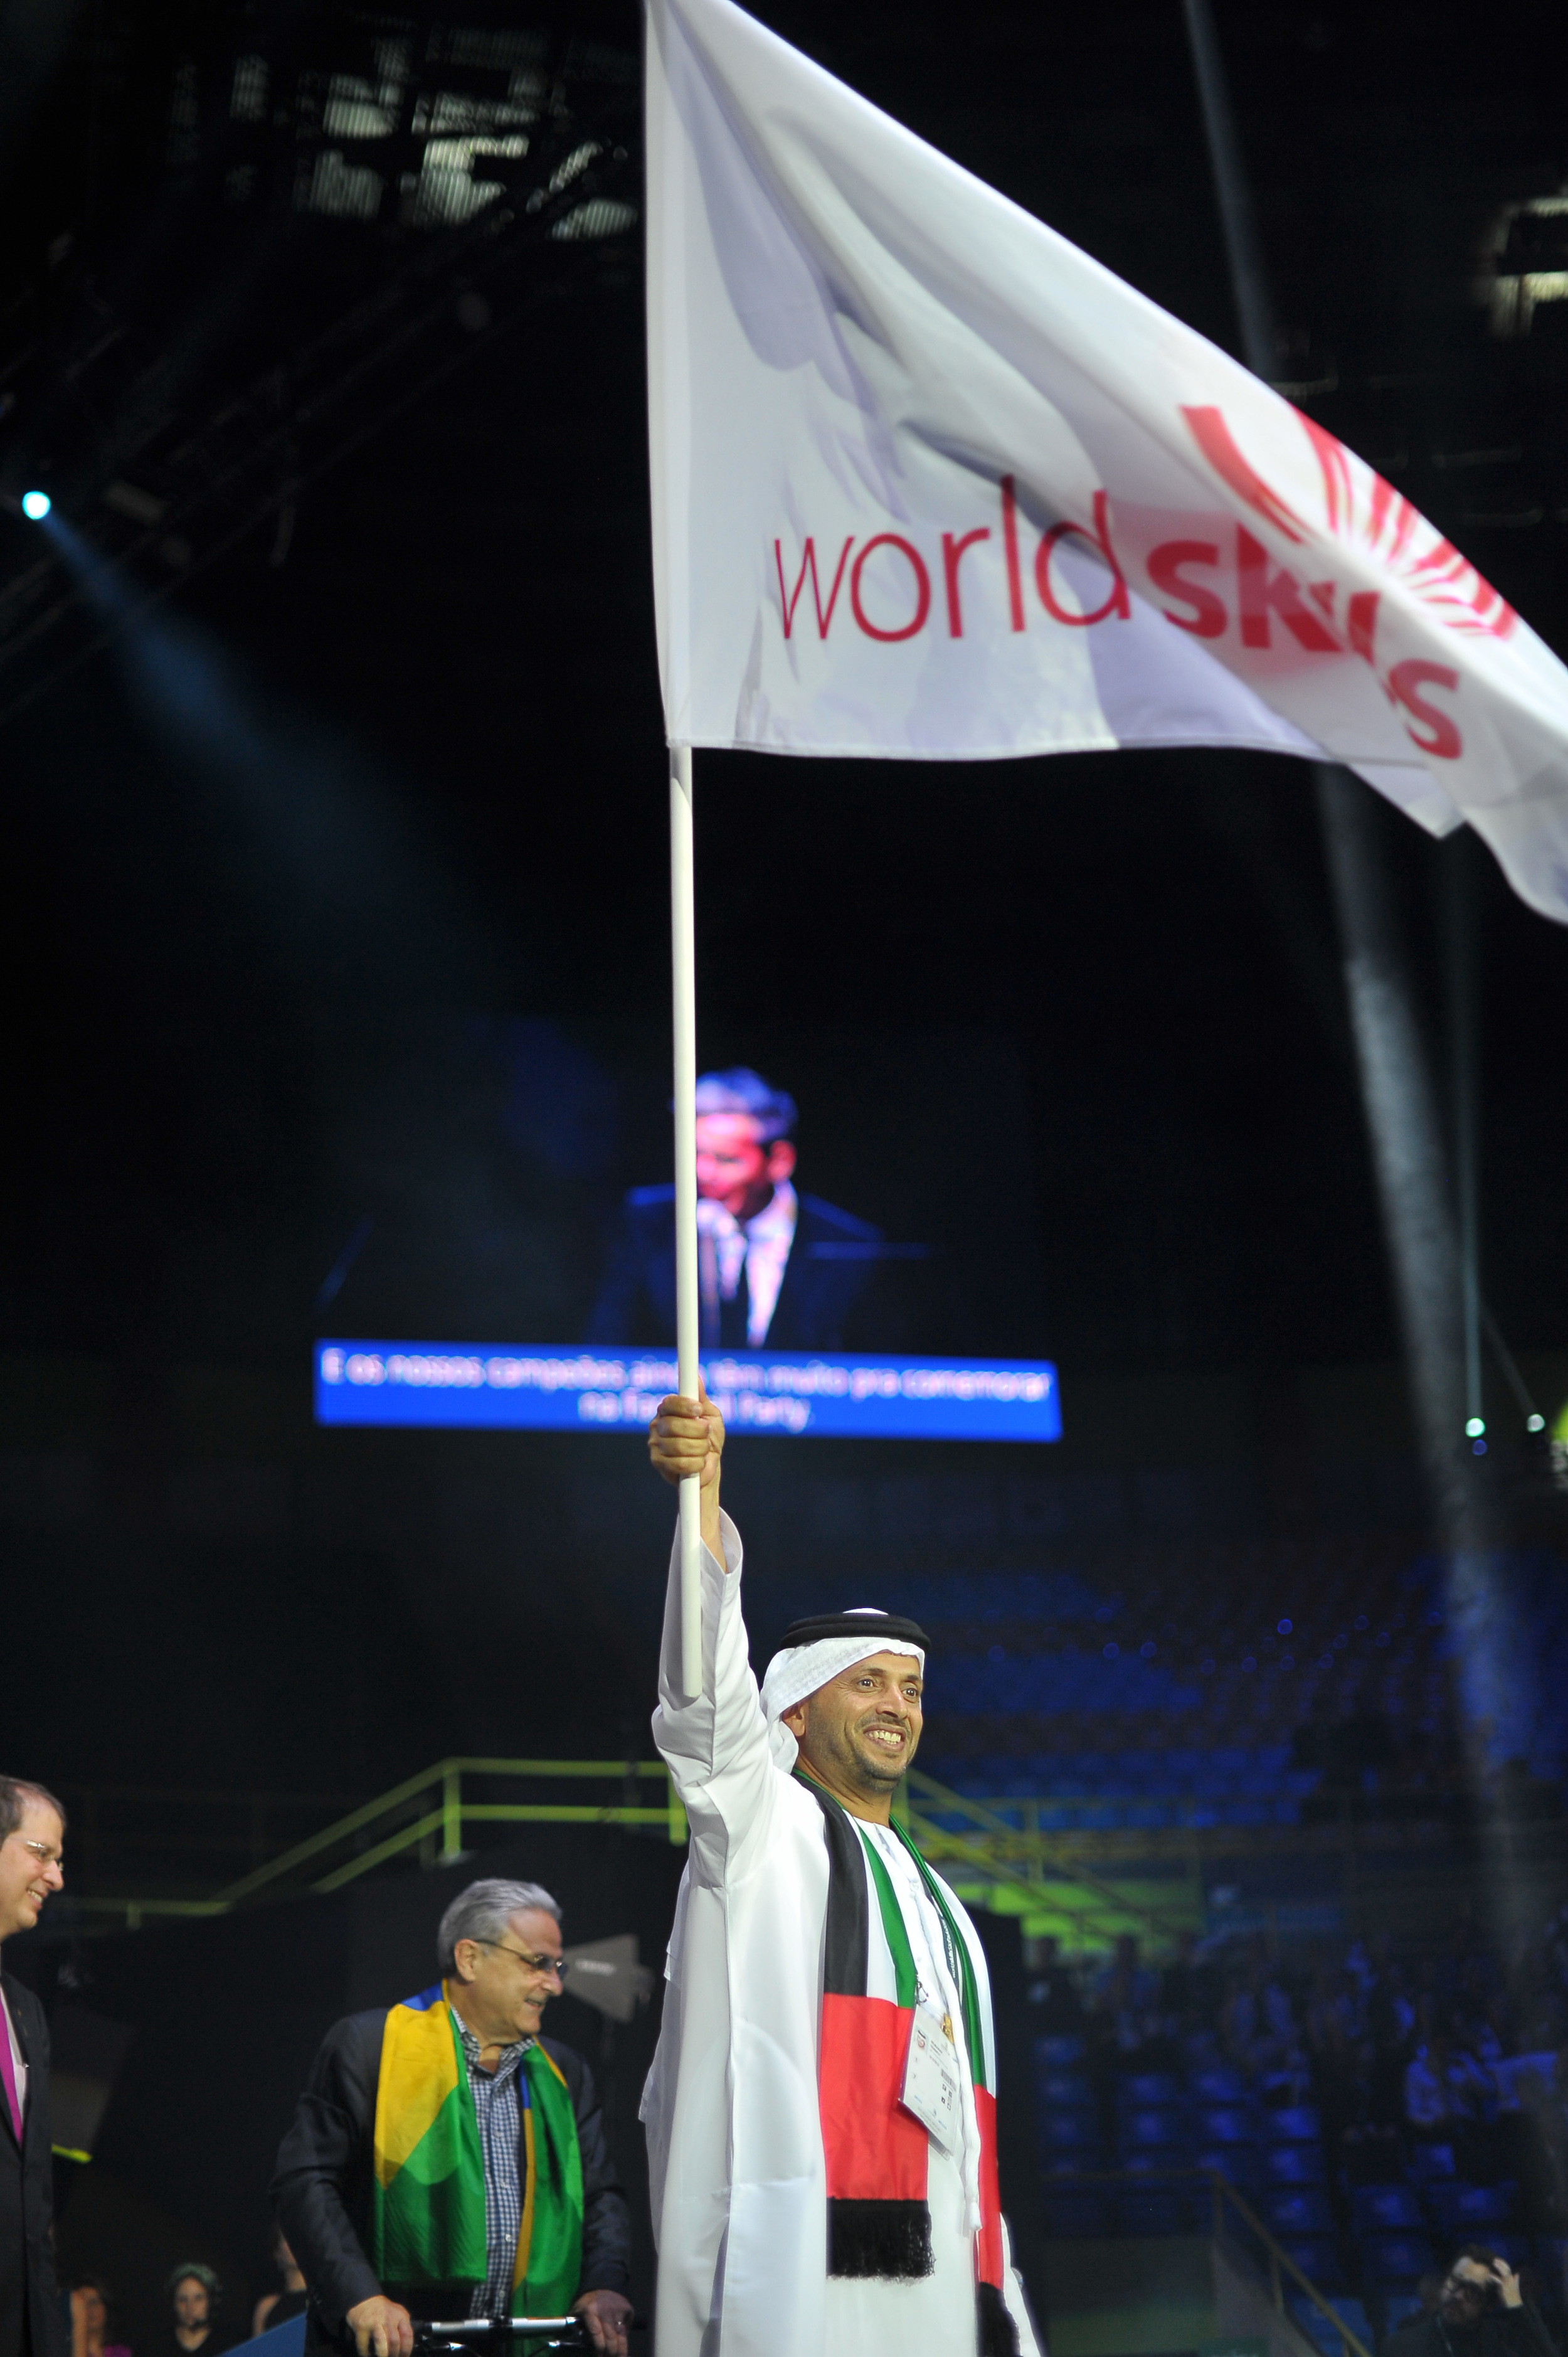 His Excellency Mubarak Saeed Al Shamsi with the WorldSkills flag (Photo credit: WorldSkills International)